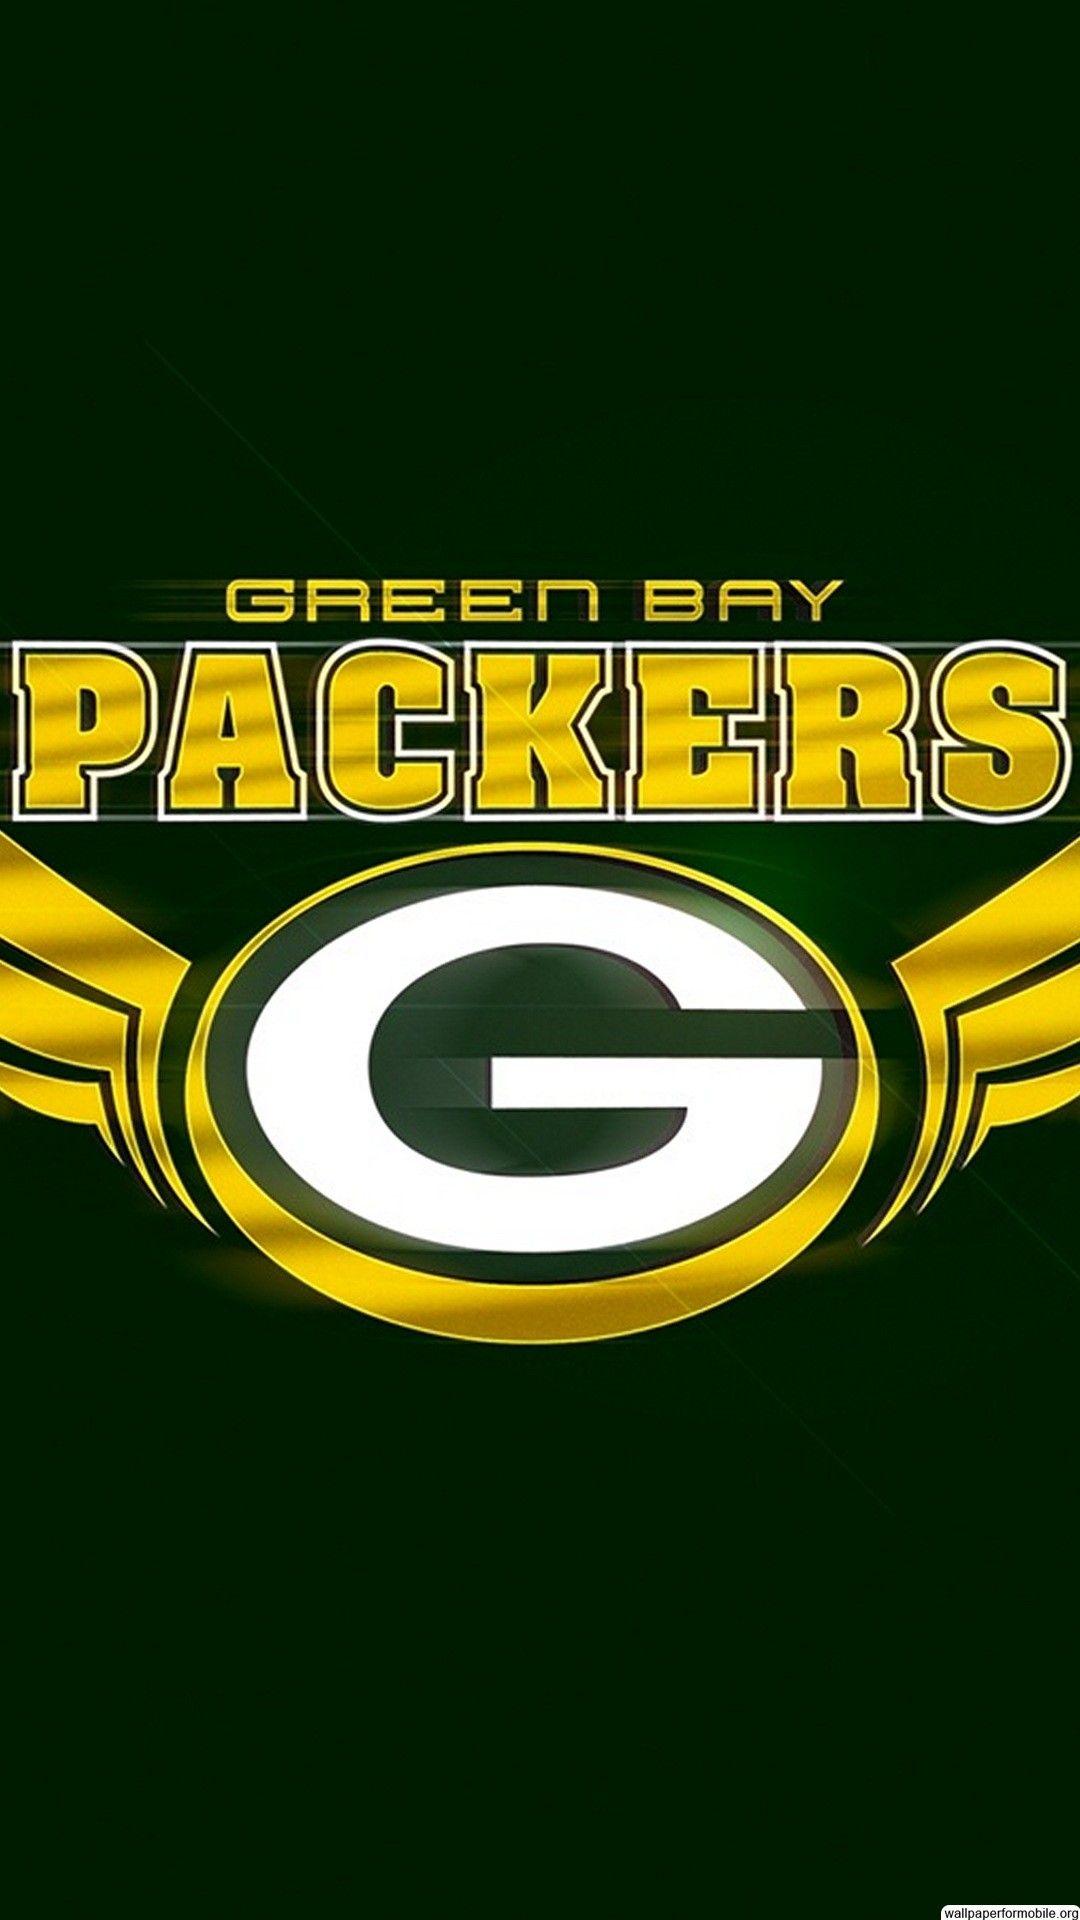 Aaron Rodgers Green Bay Packers Wallpaper aaron rodgers